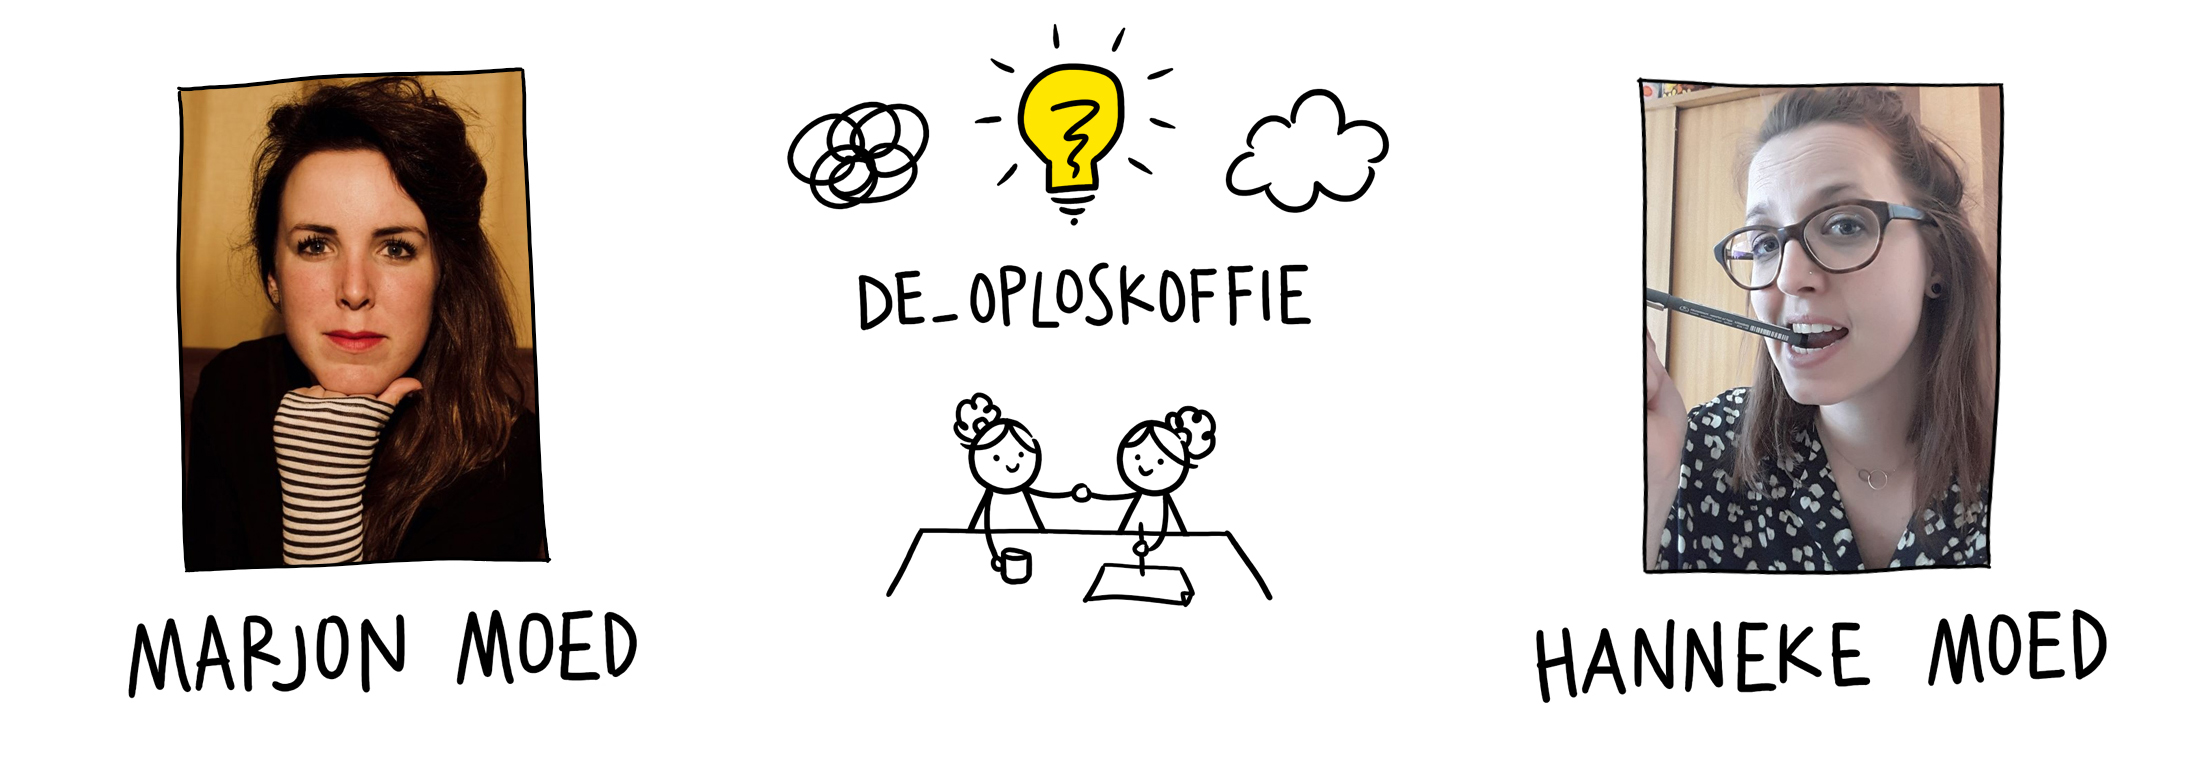 marjonmoed hannekemoed de_oploskoffie